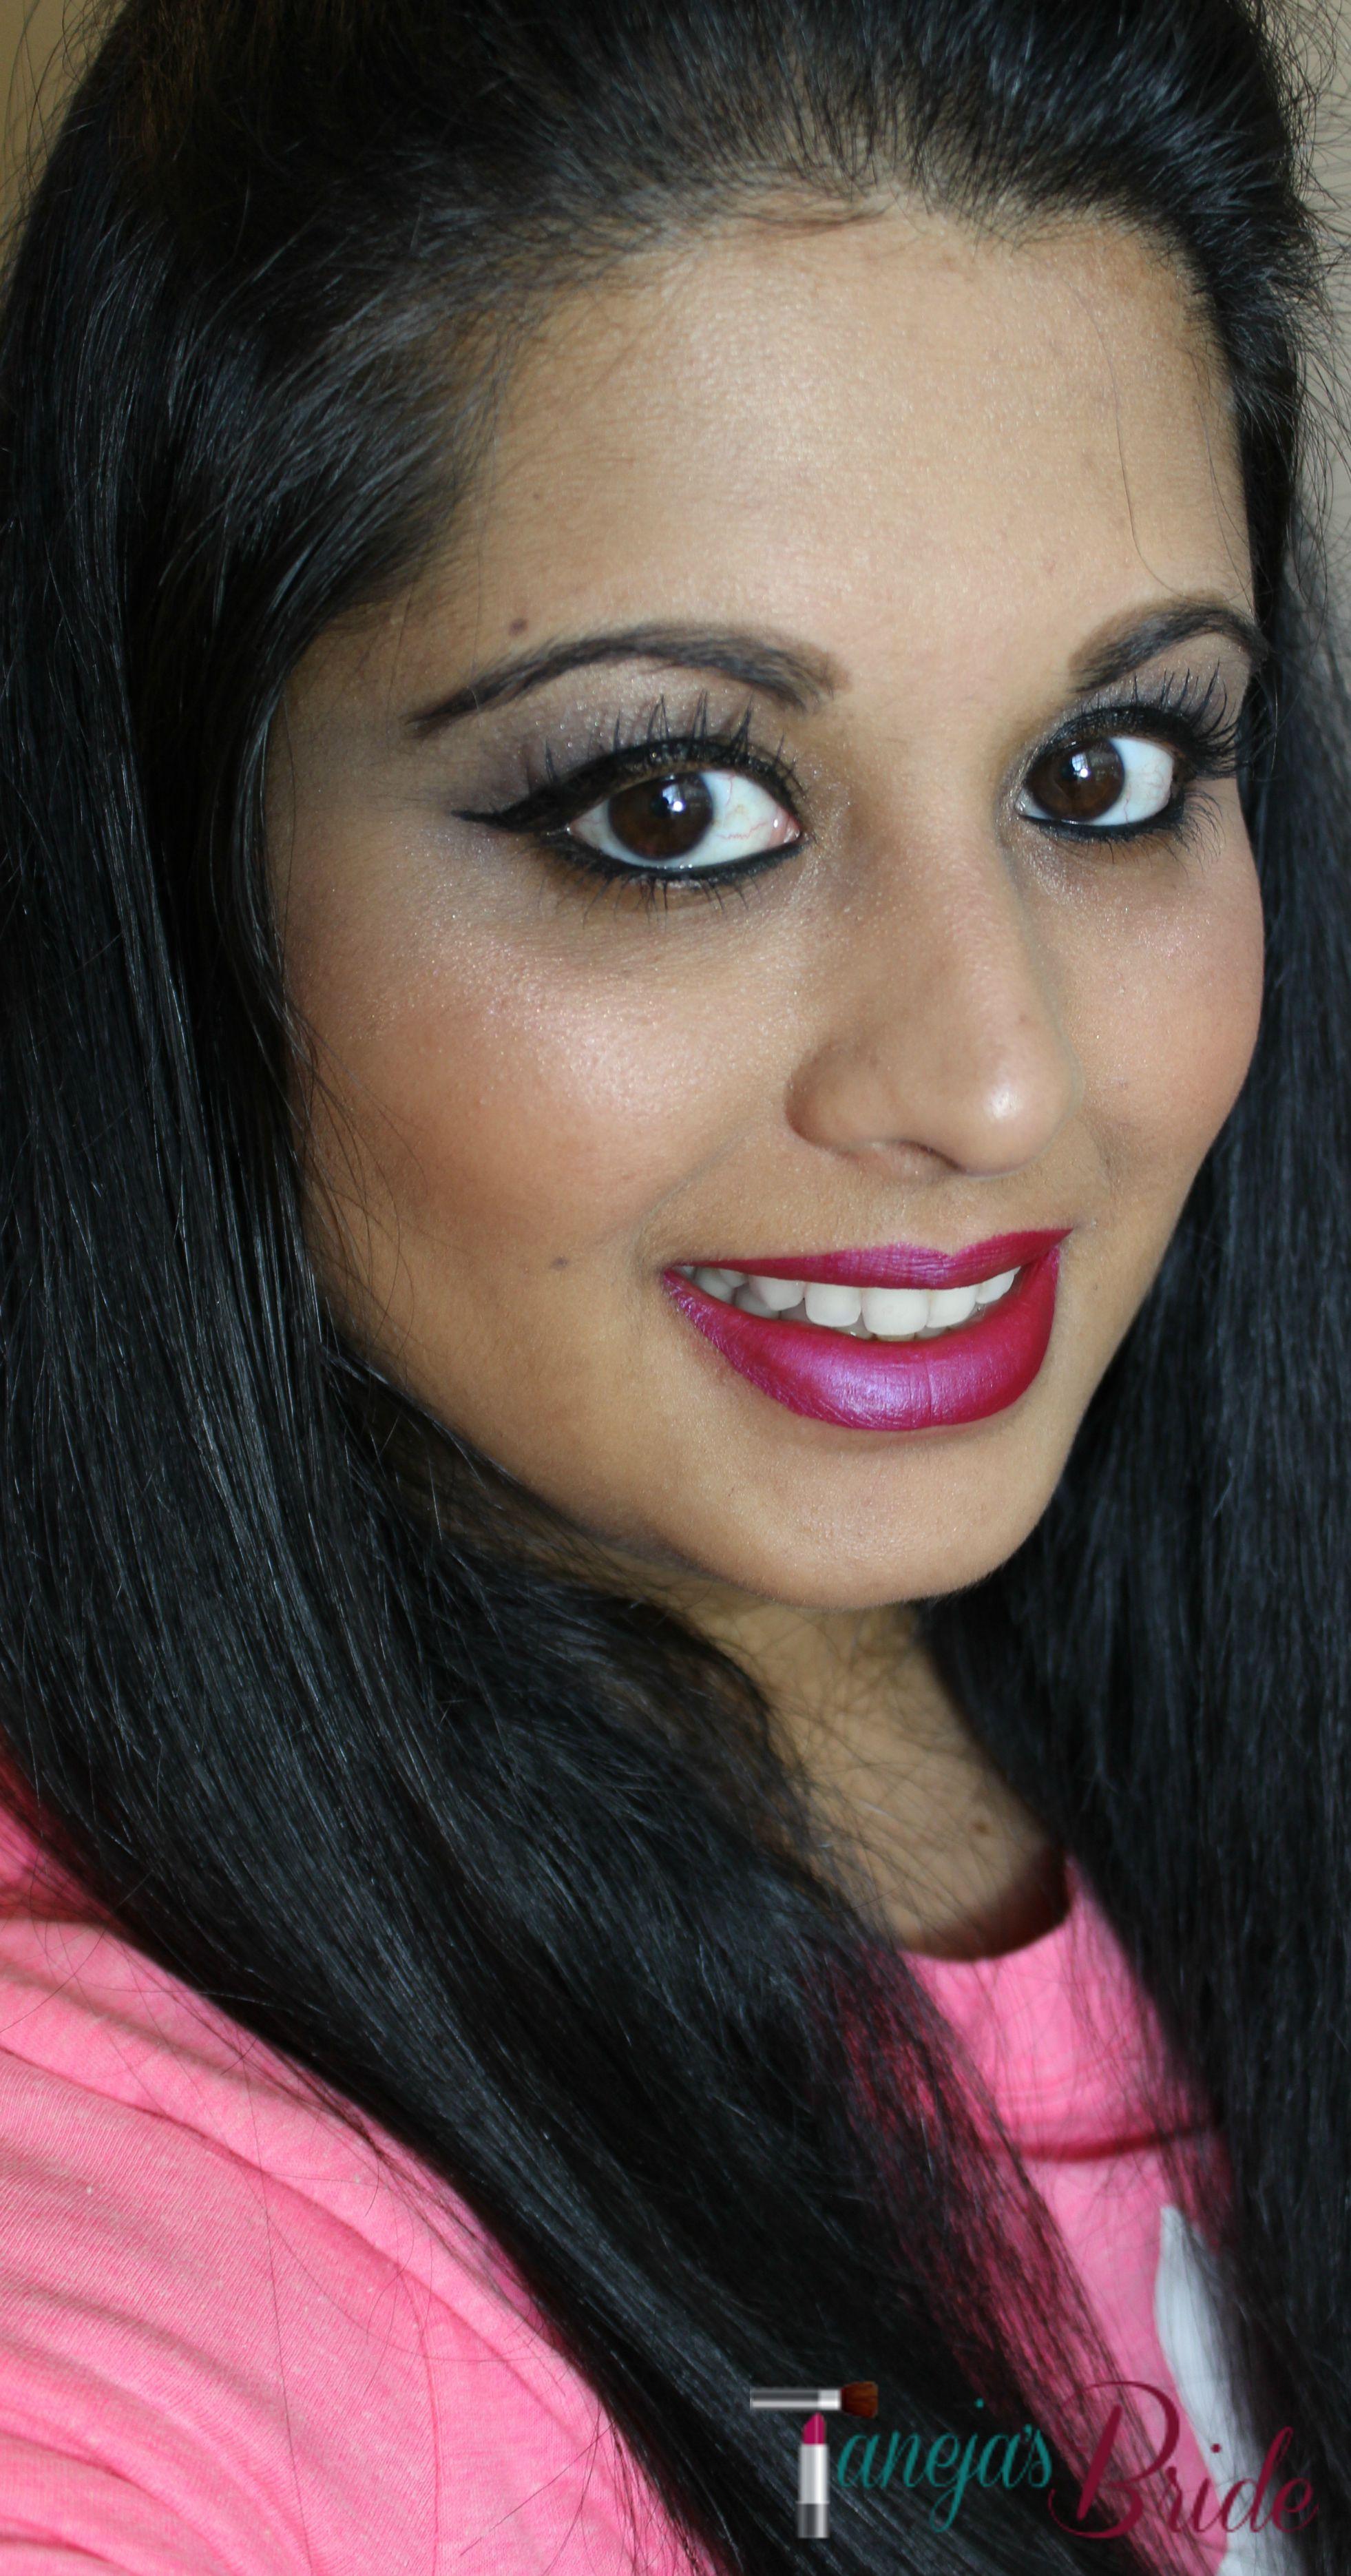 Anastasia Beverly Hills Liquid Lipstick Swatches T: Taneja's Bride